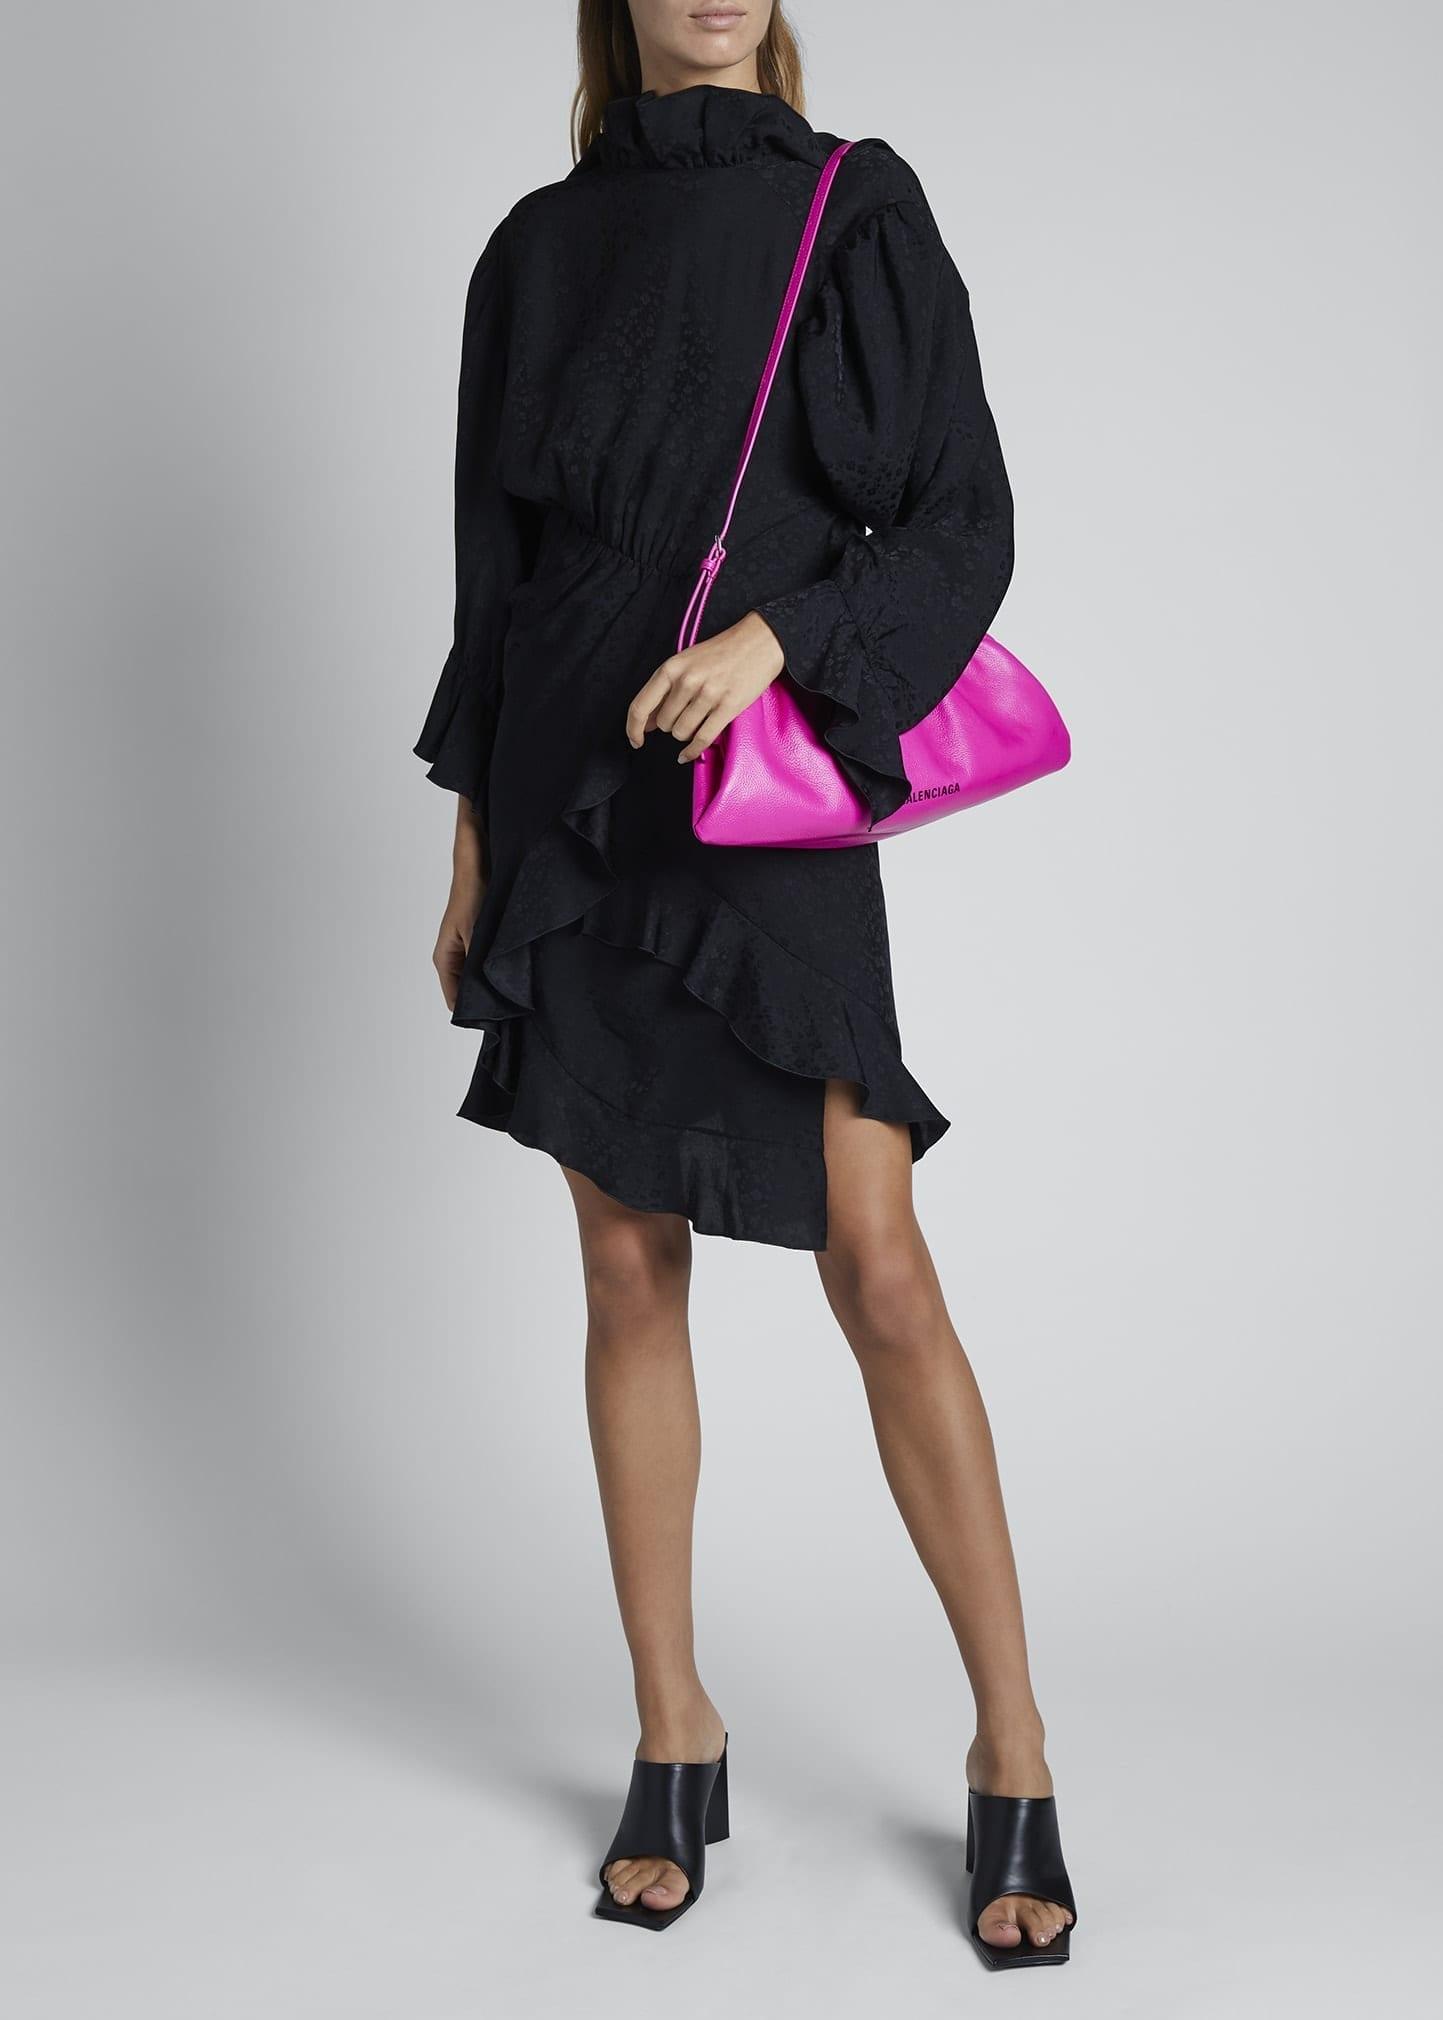 BALENCIAGA Satin Turtleneck Square-Neck Ruffle Strap Dress